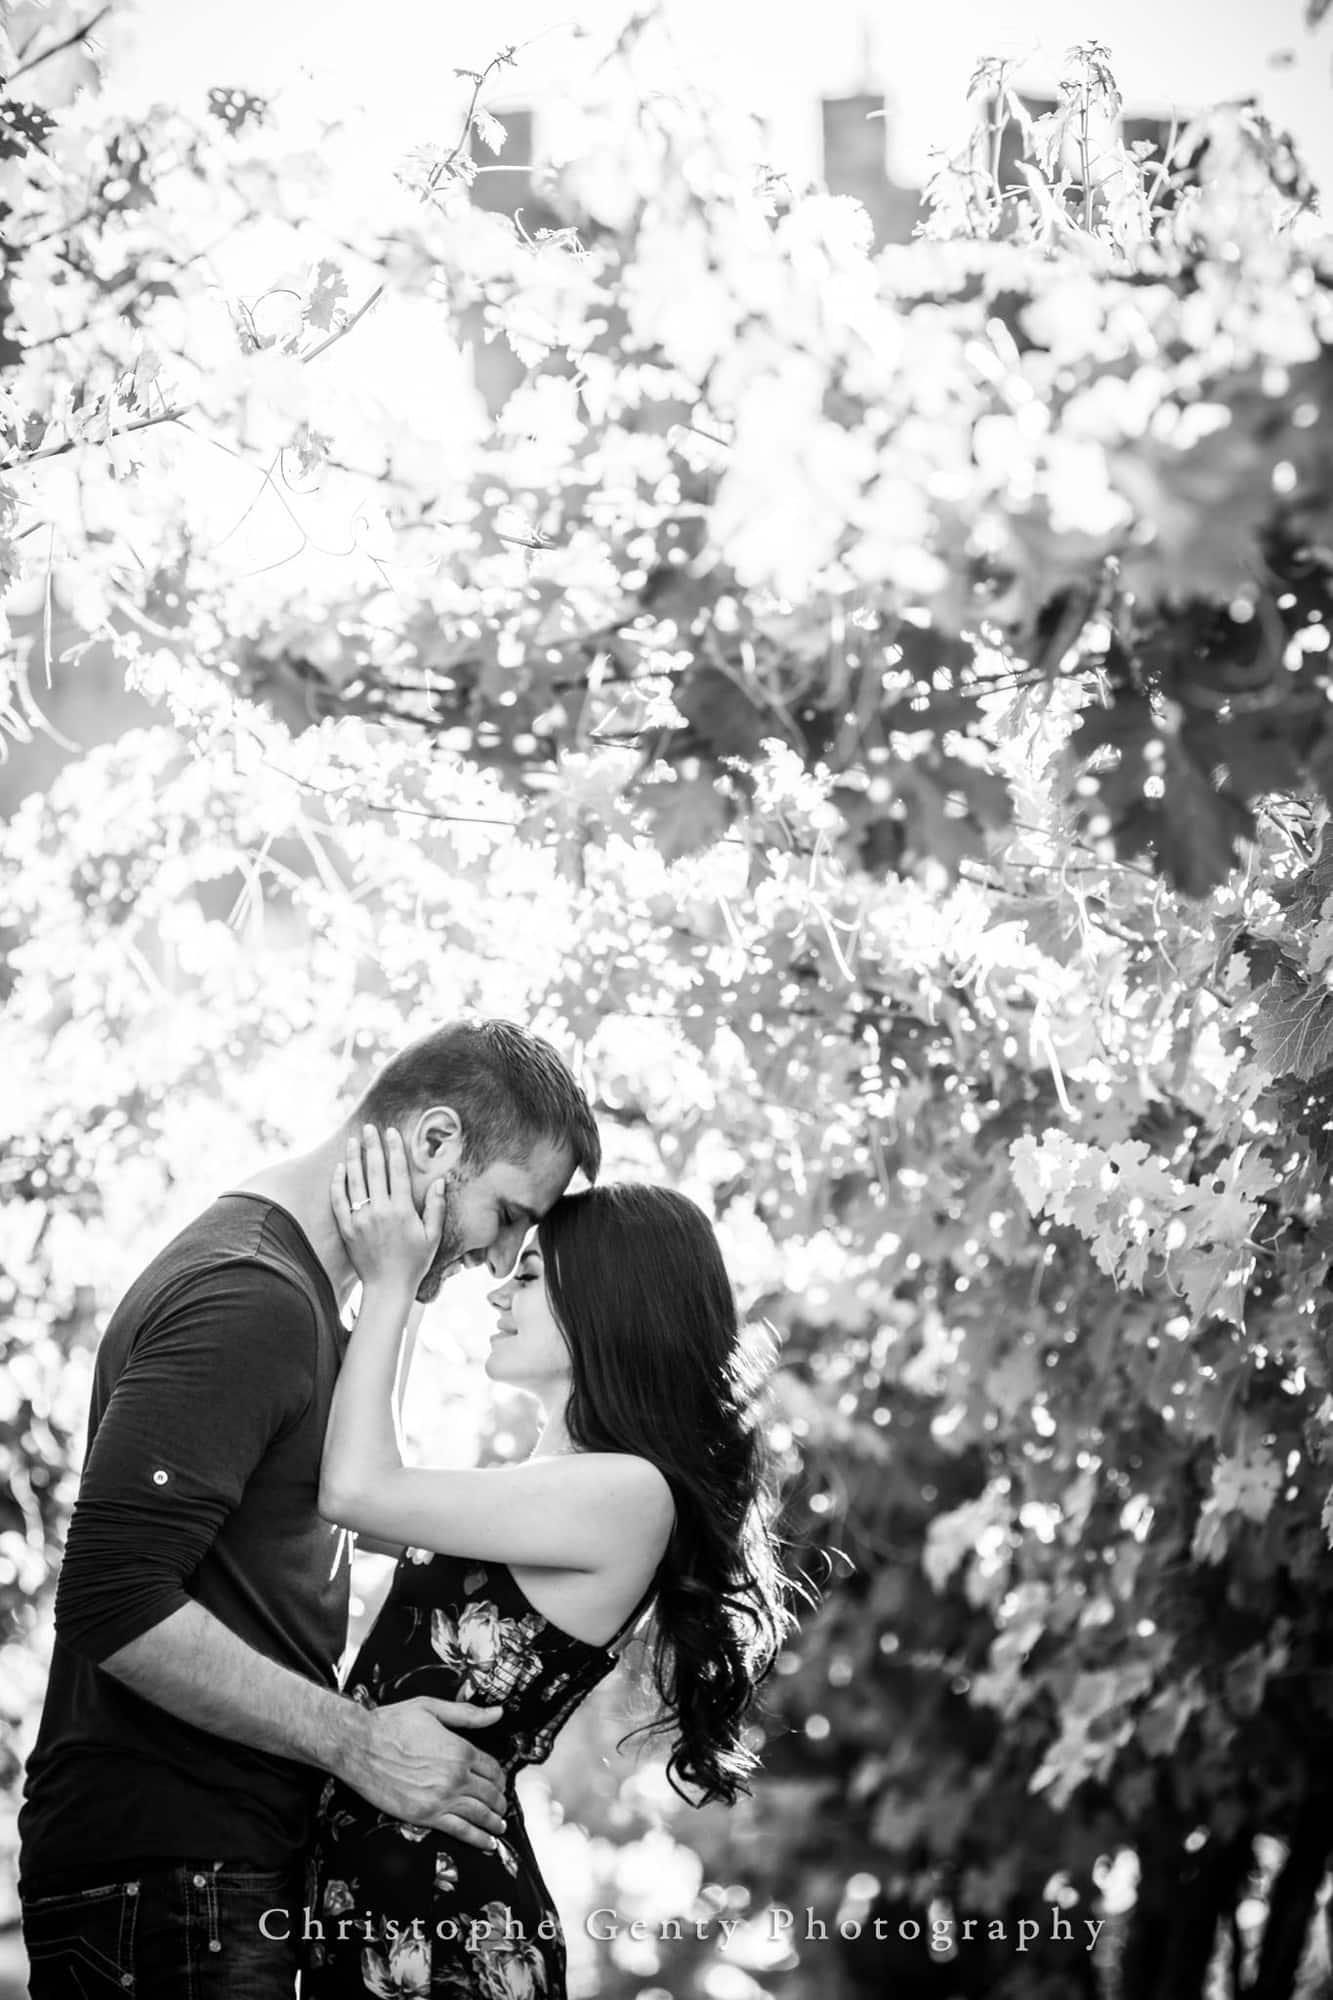 Castello di Amorosa Marriage Proposal Photography 356